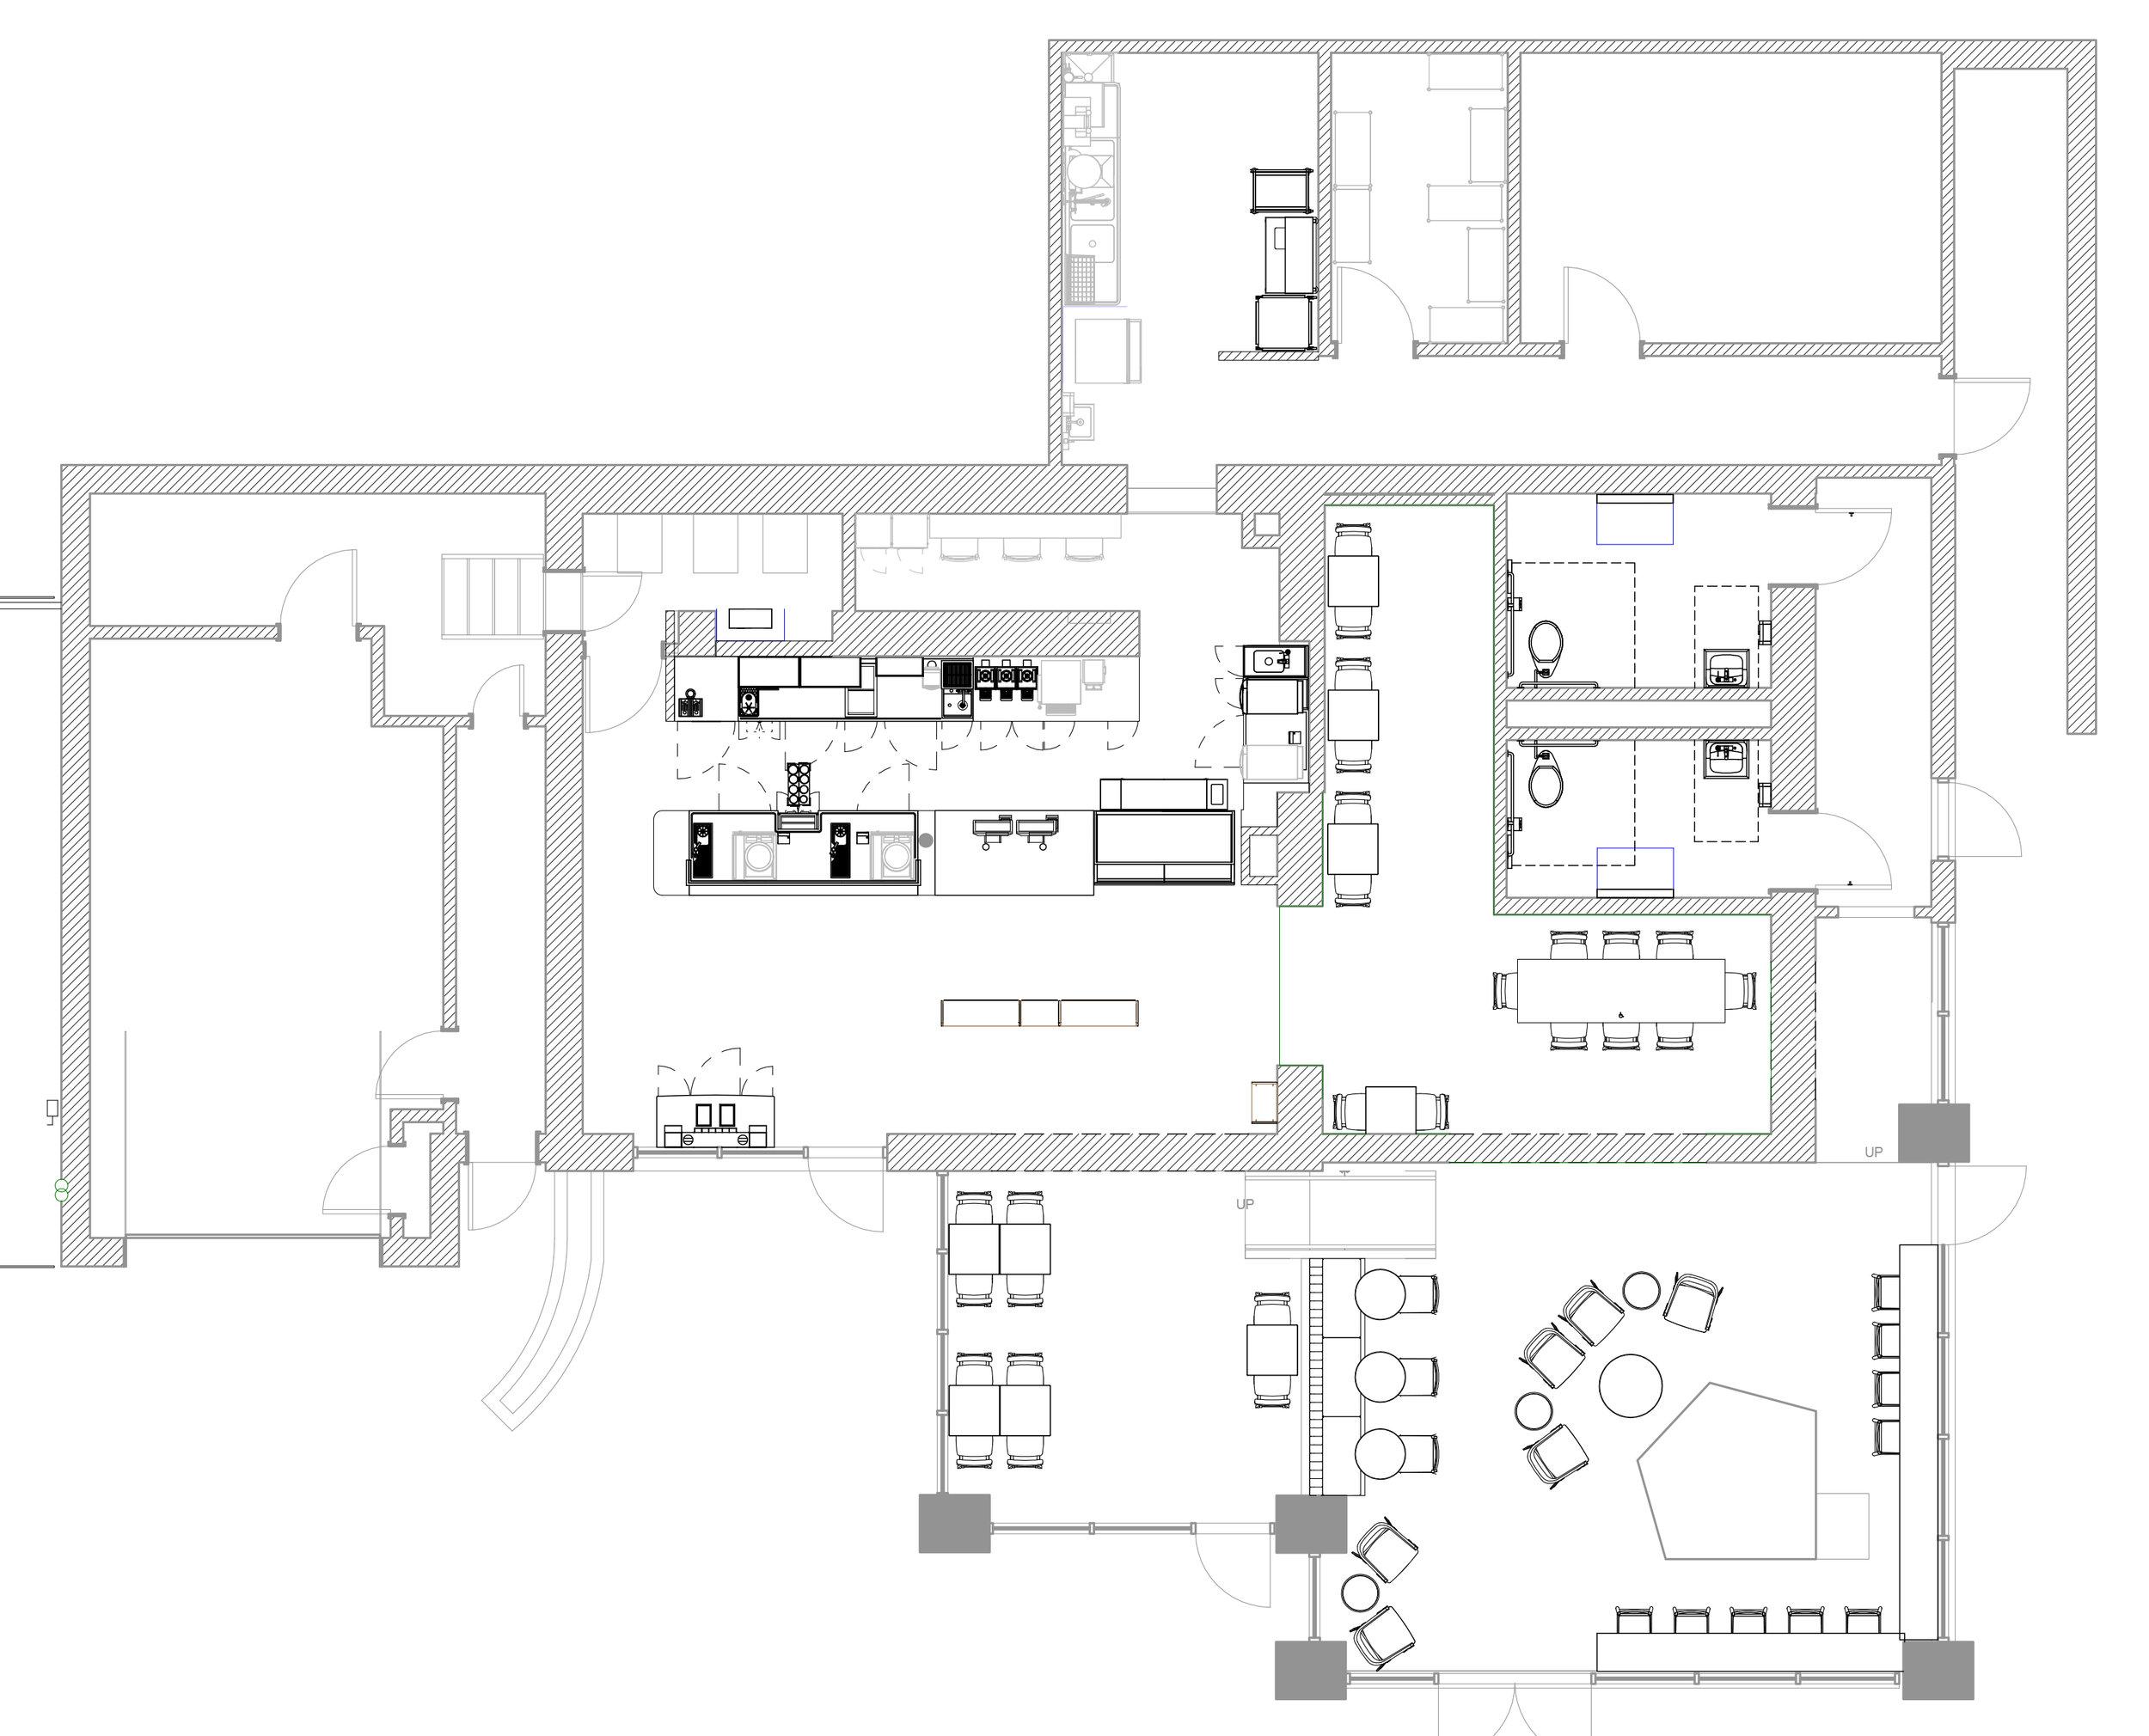 rock city_floorplan_sd2.jpg